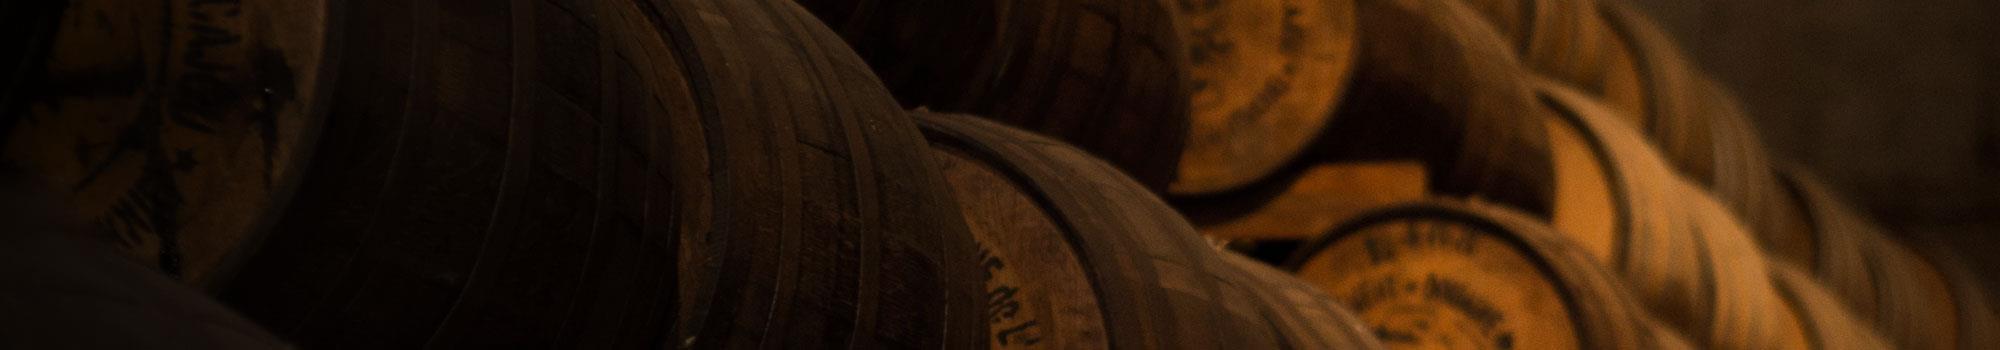 Irish Blended Whiskey